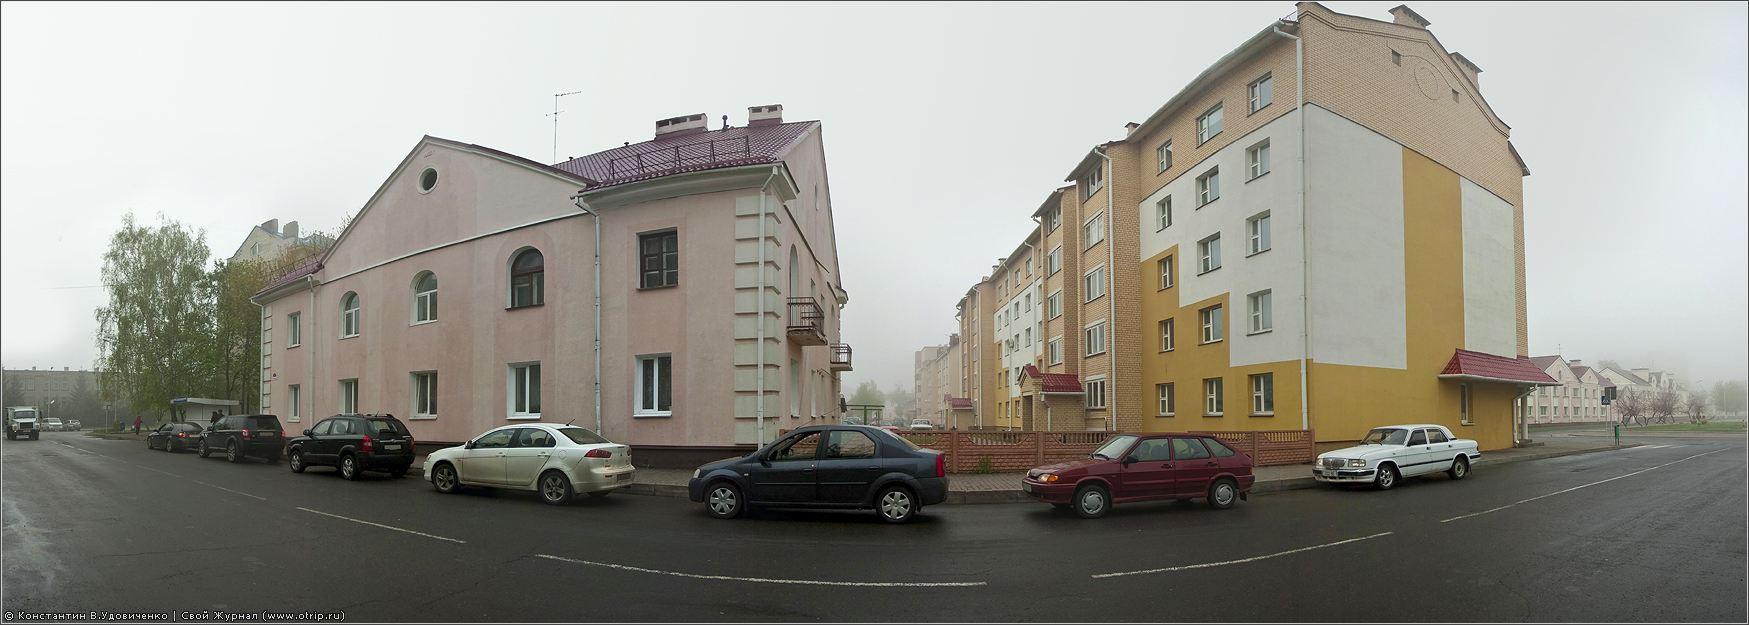 3769-3778-7871x3151s_2.jpg - Беларусь 2010 (01-03.05.2010)